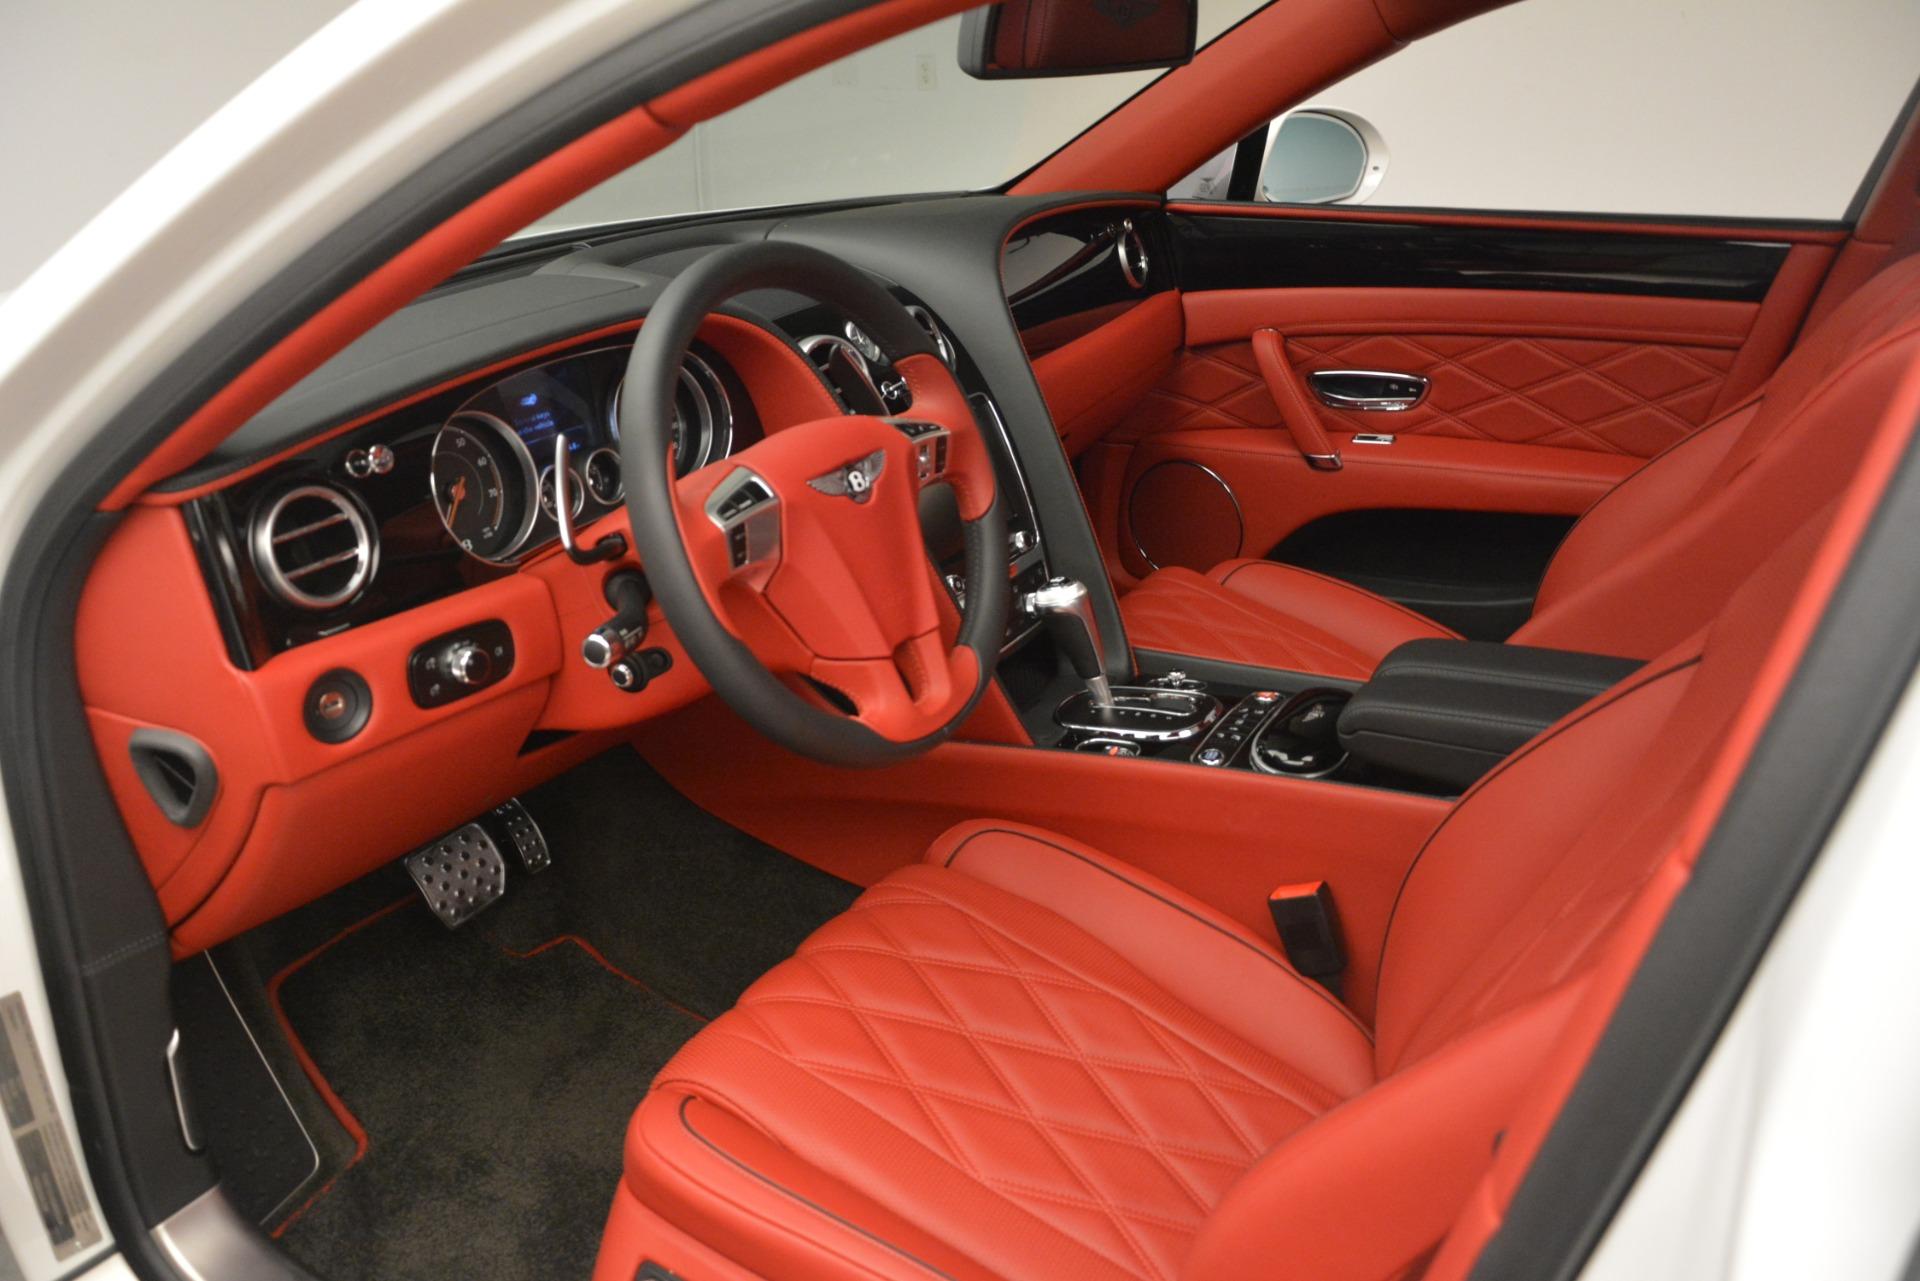 Used 2016 Bentley Flying Spur V8 For Sale In Westport, CT 3265_p18